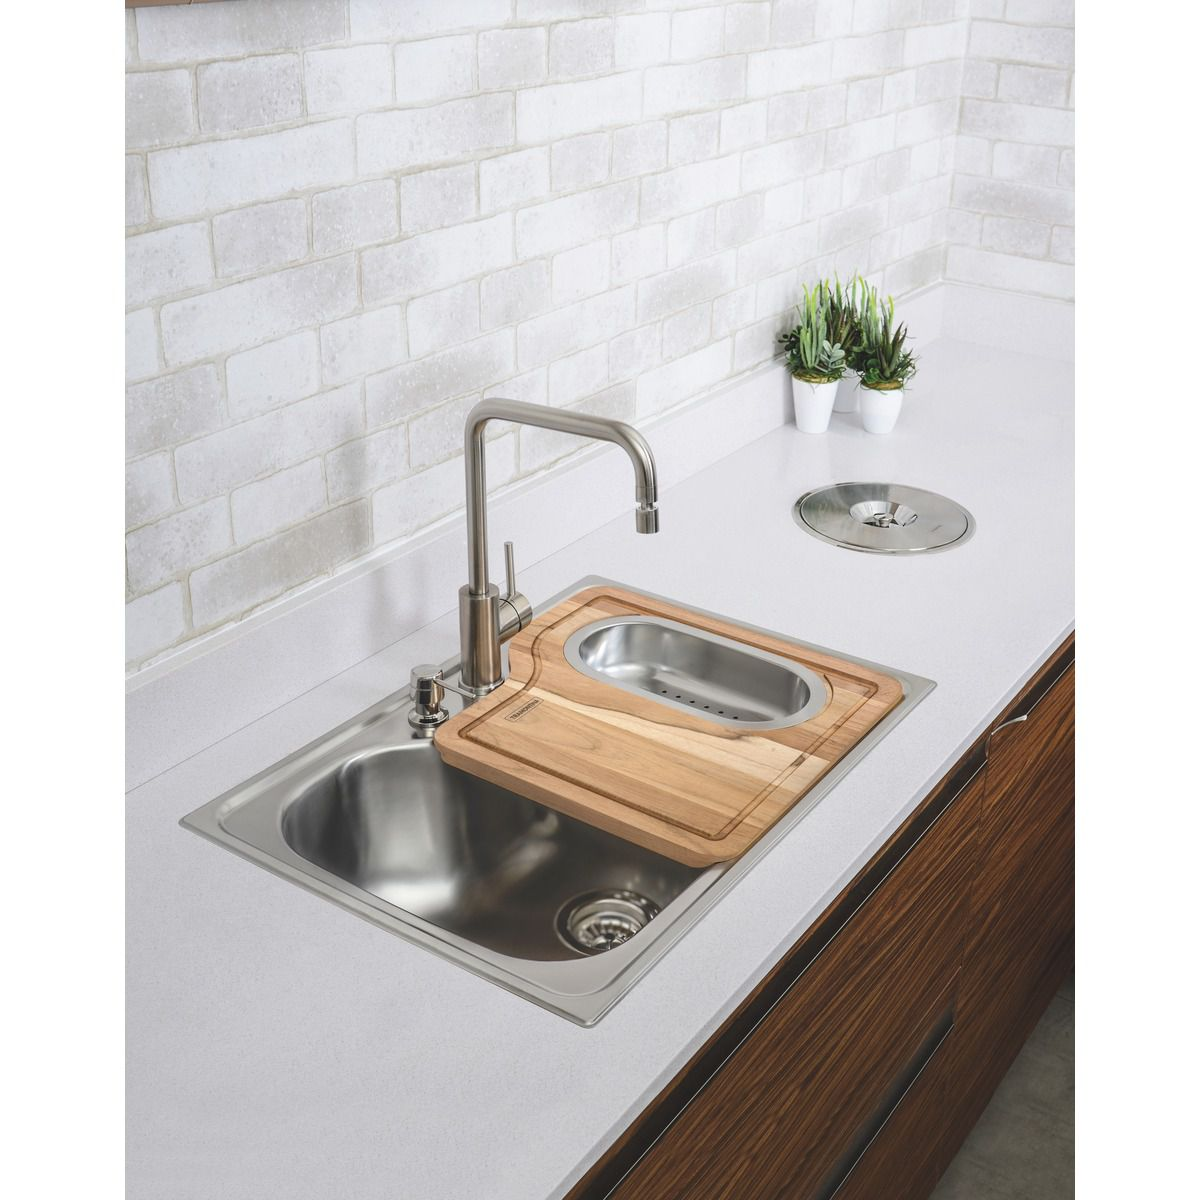 LIXEIRA DE EMBUTIR CLEAN 5 LITROS 94518005 - TRAMONTINA